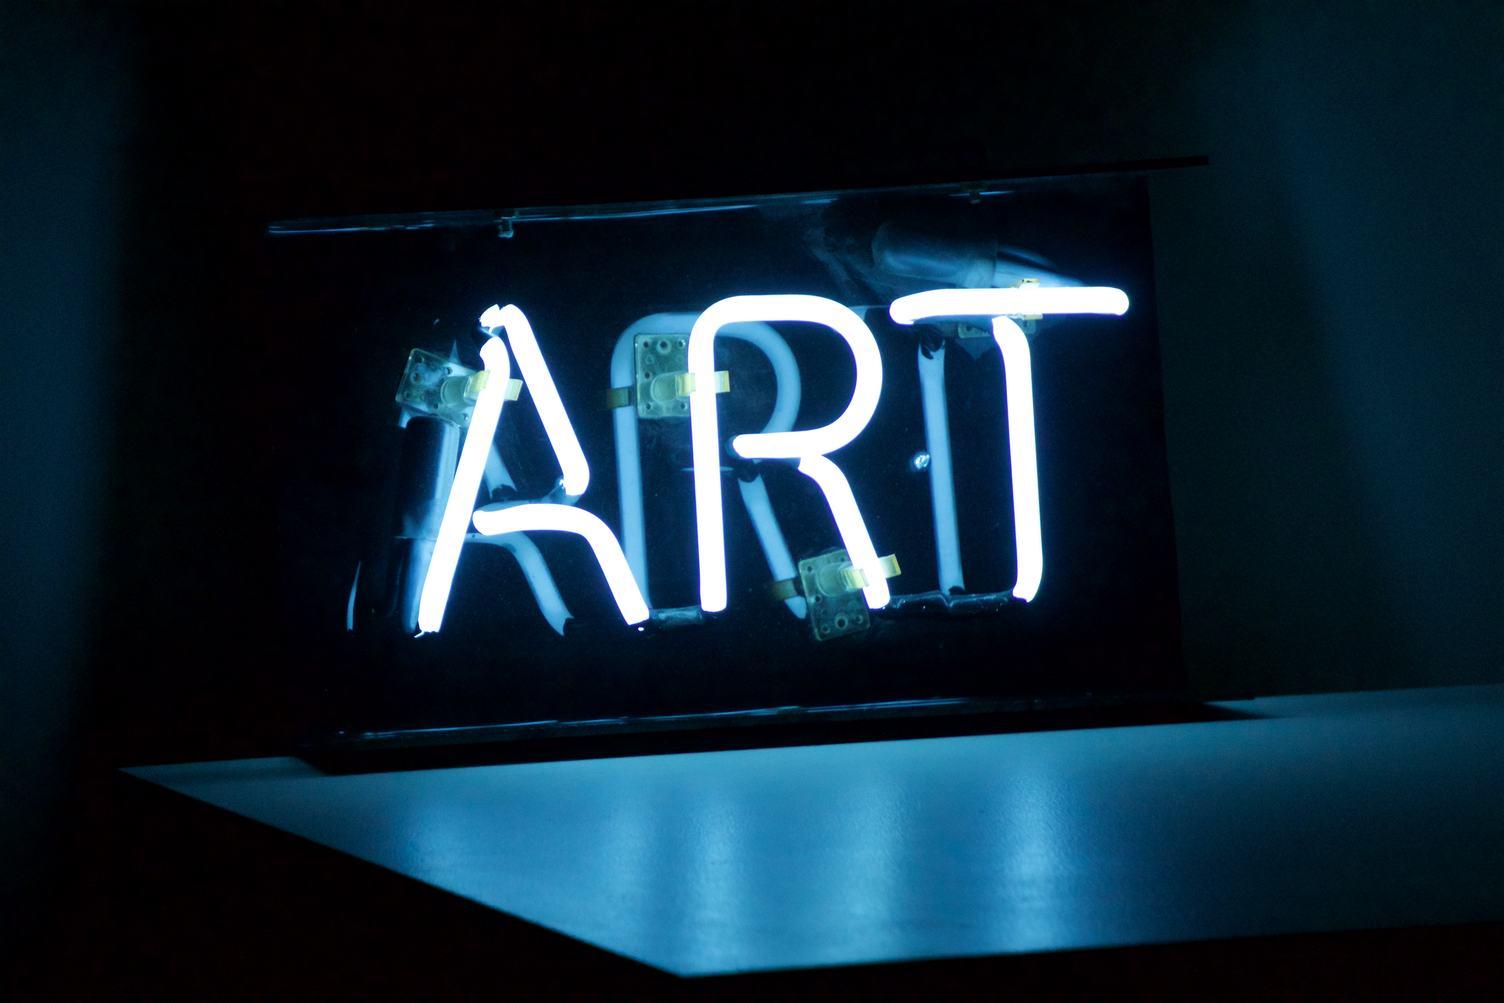 Art Inscription on the Neon